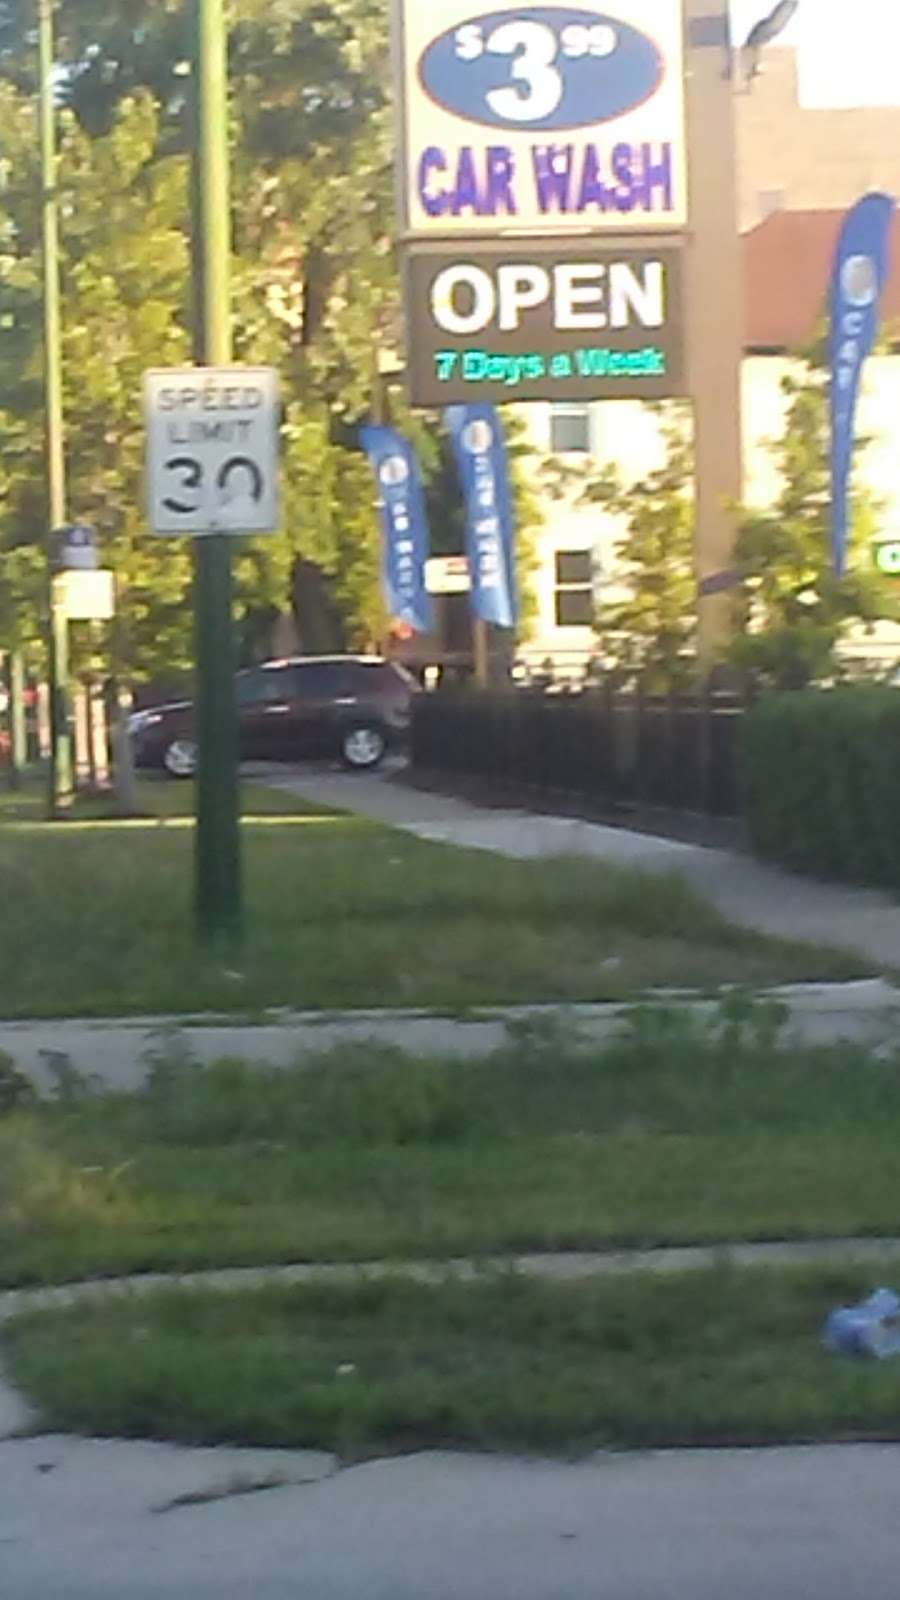 Buddy Bear Car Wash - car wash  | Photo 6 of 10 | Address: 4130 S Western Ave, Chicago, IL 60609, USA | Phone: (773) 847-1221